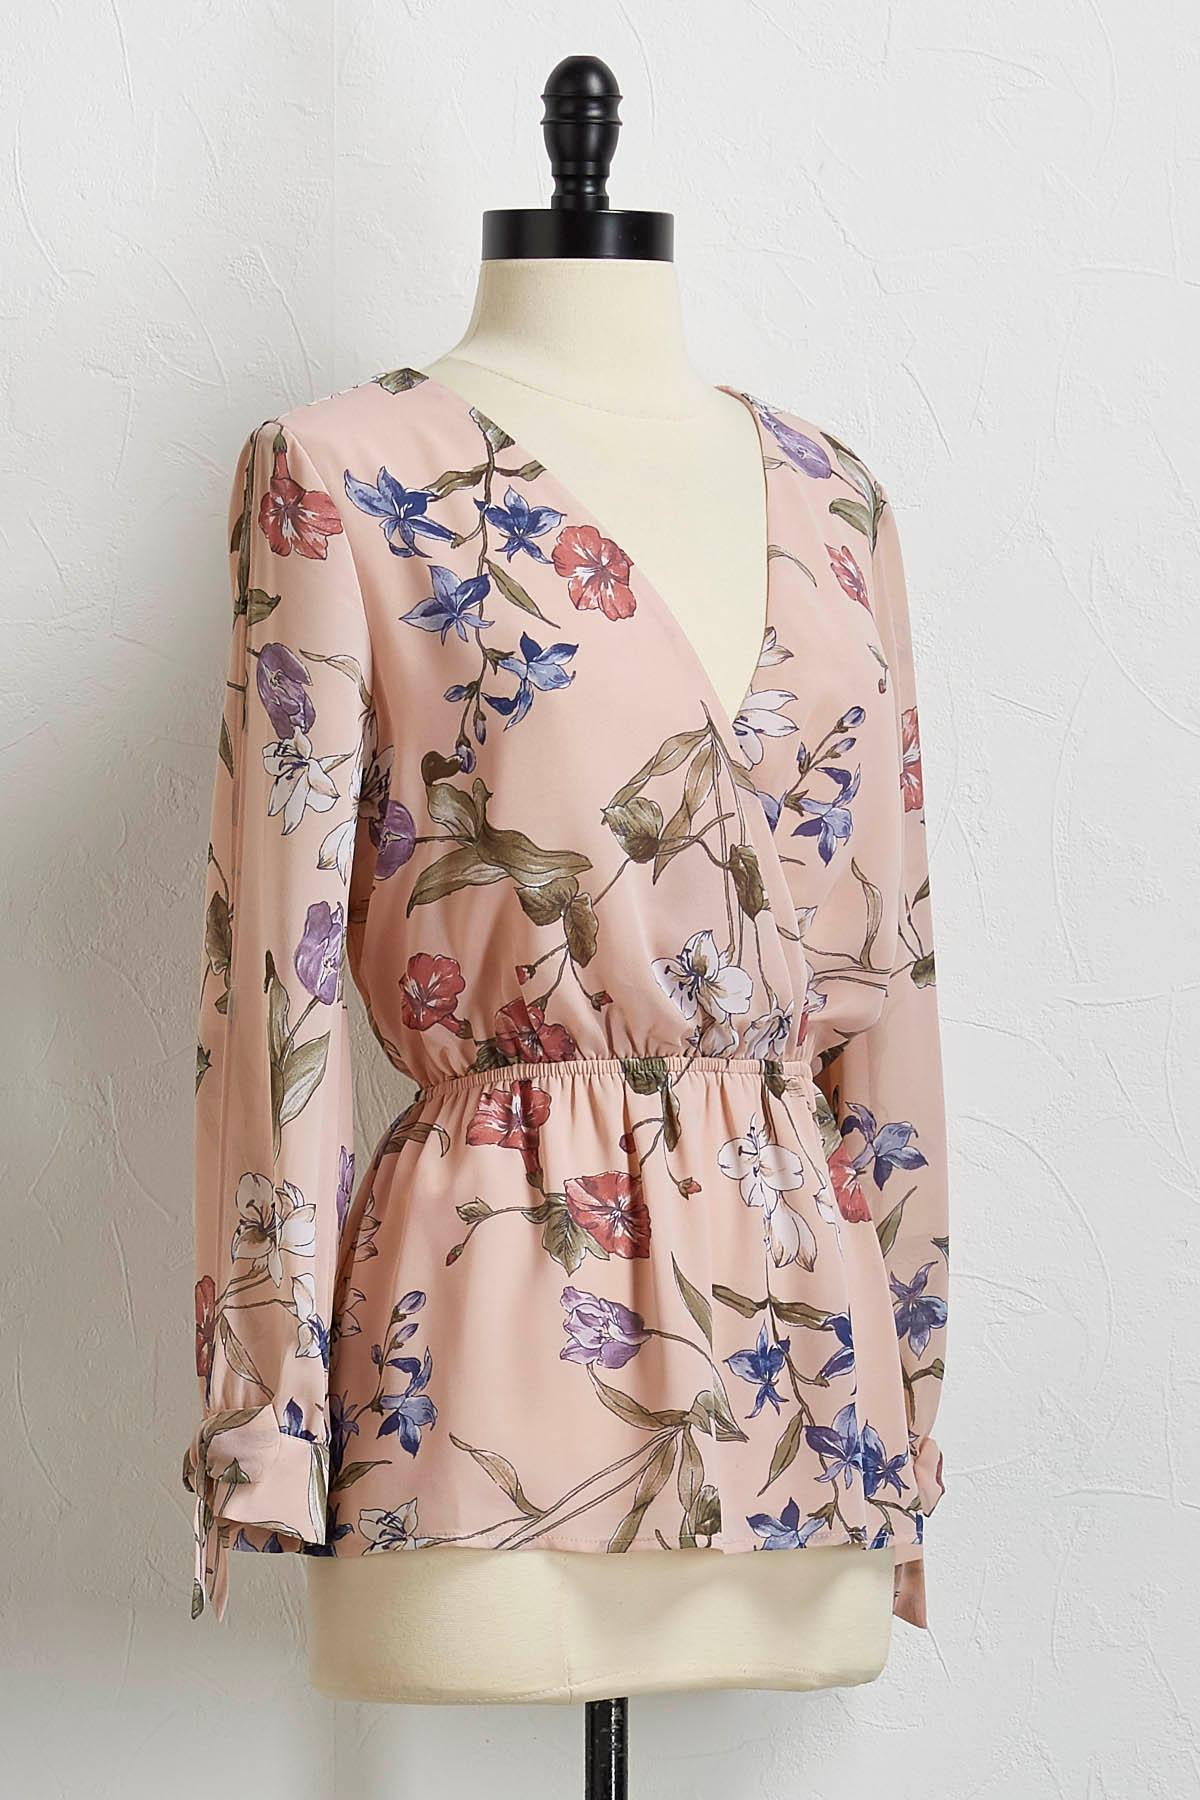 Floral Cinch Waist Top